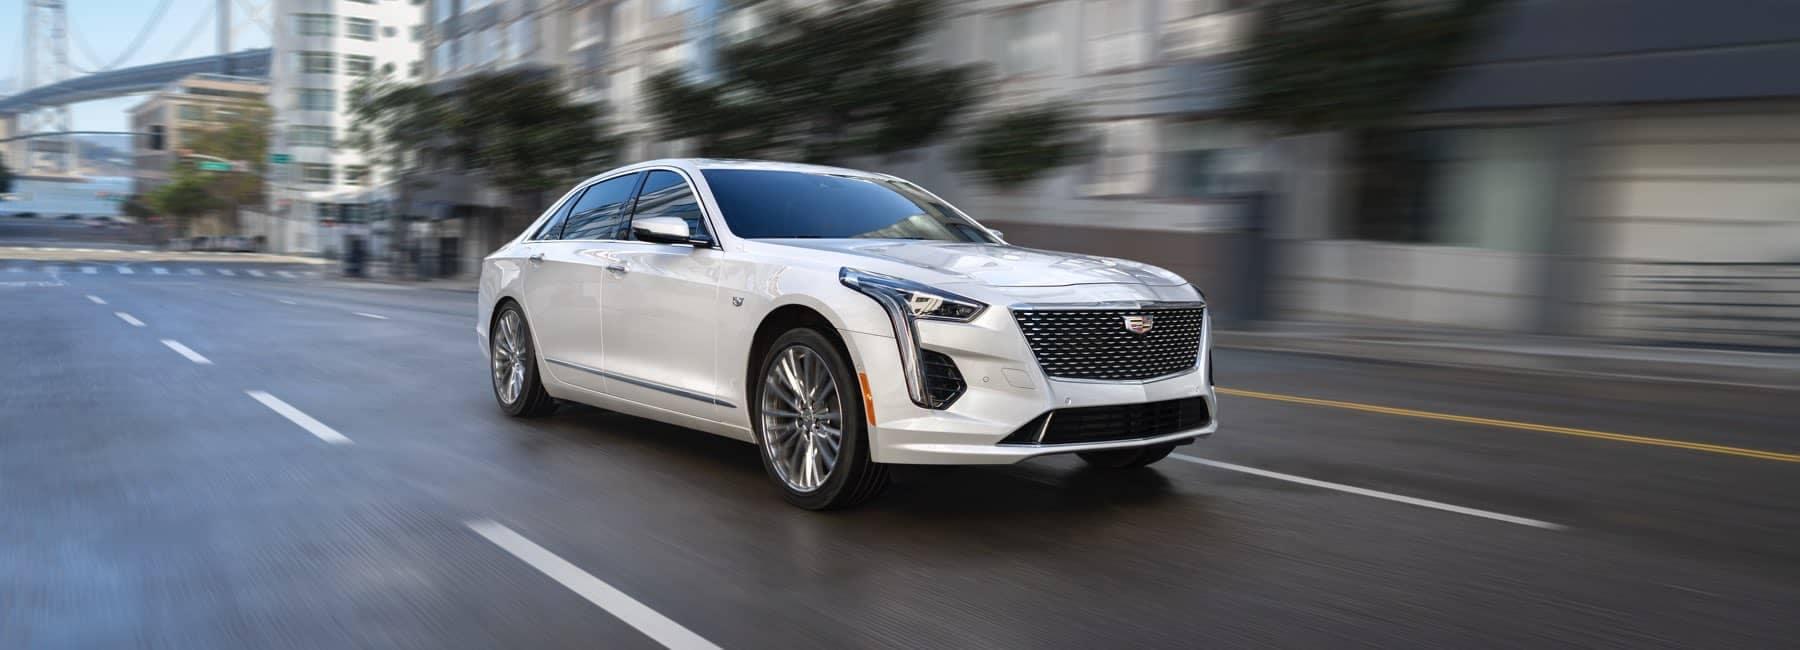 2020 Cadillac CT6 driving down city street